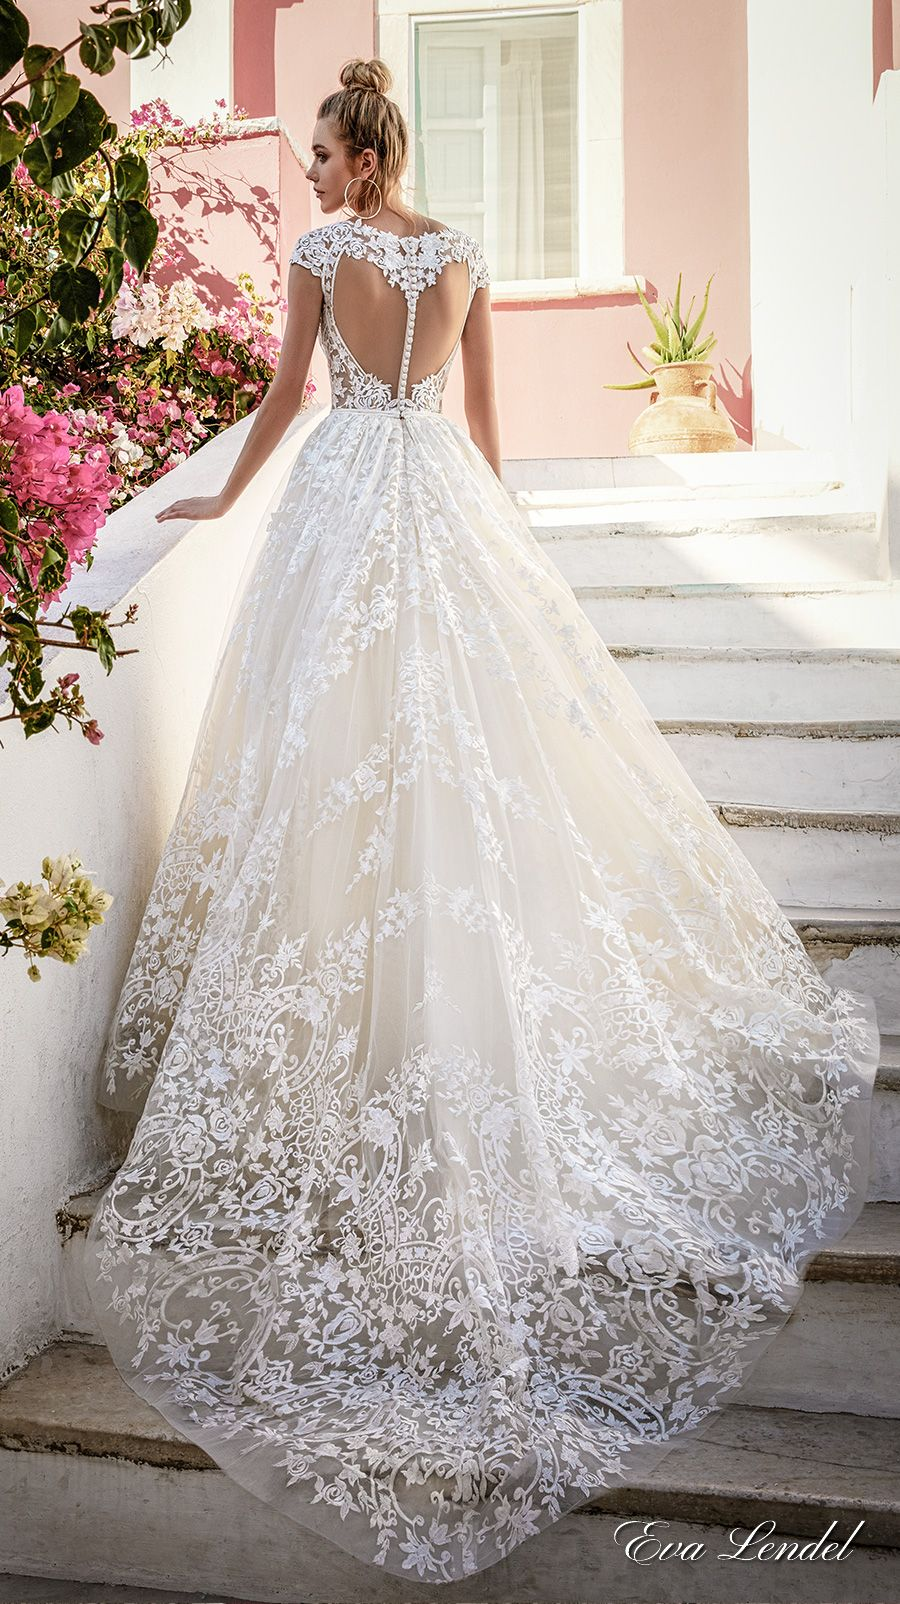 Eva lendel 2017 wedding dresses santorini bridal for How to dress for a wedding